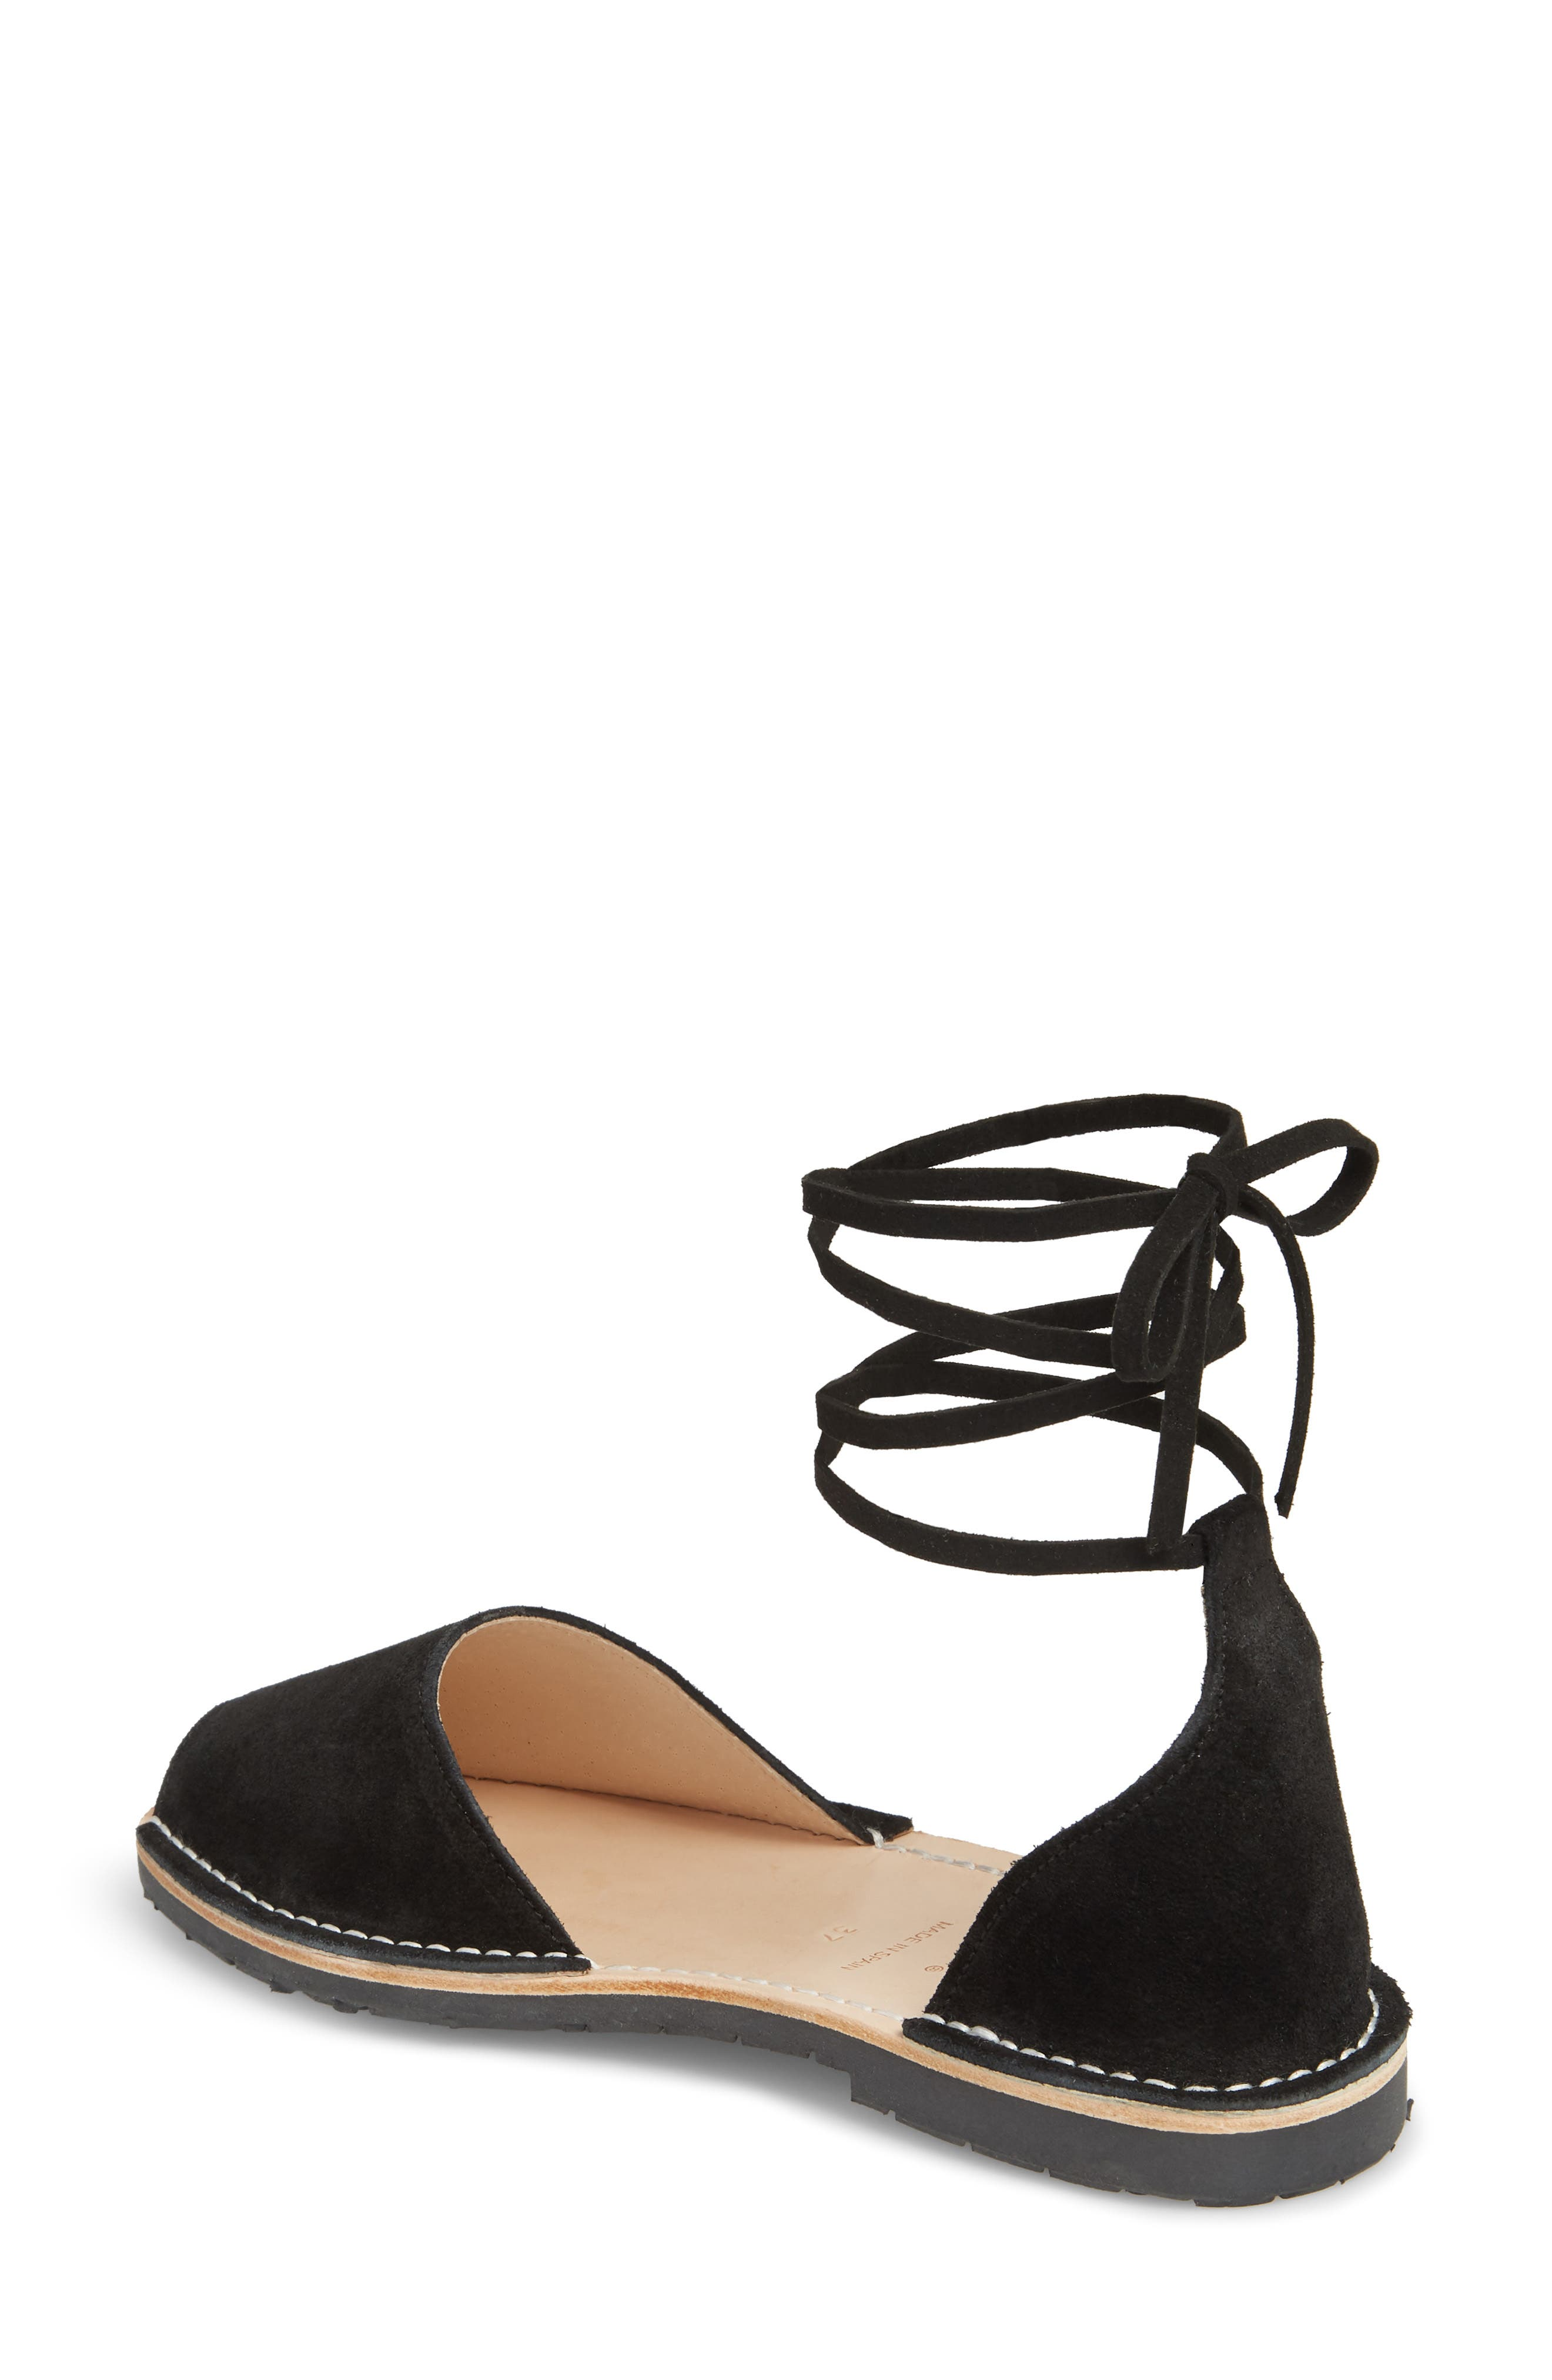 Ankle Tie Sandal,                             Alternate thumbnail 2, color,                             Black